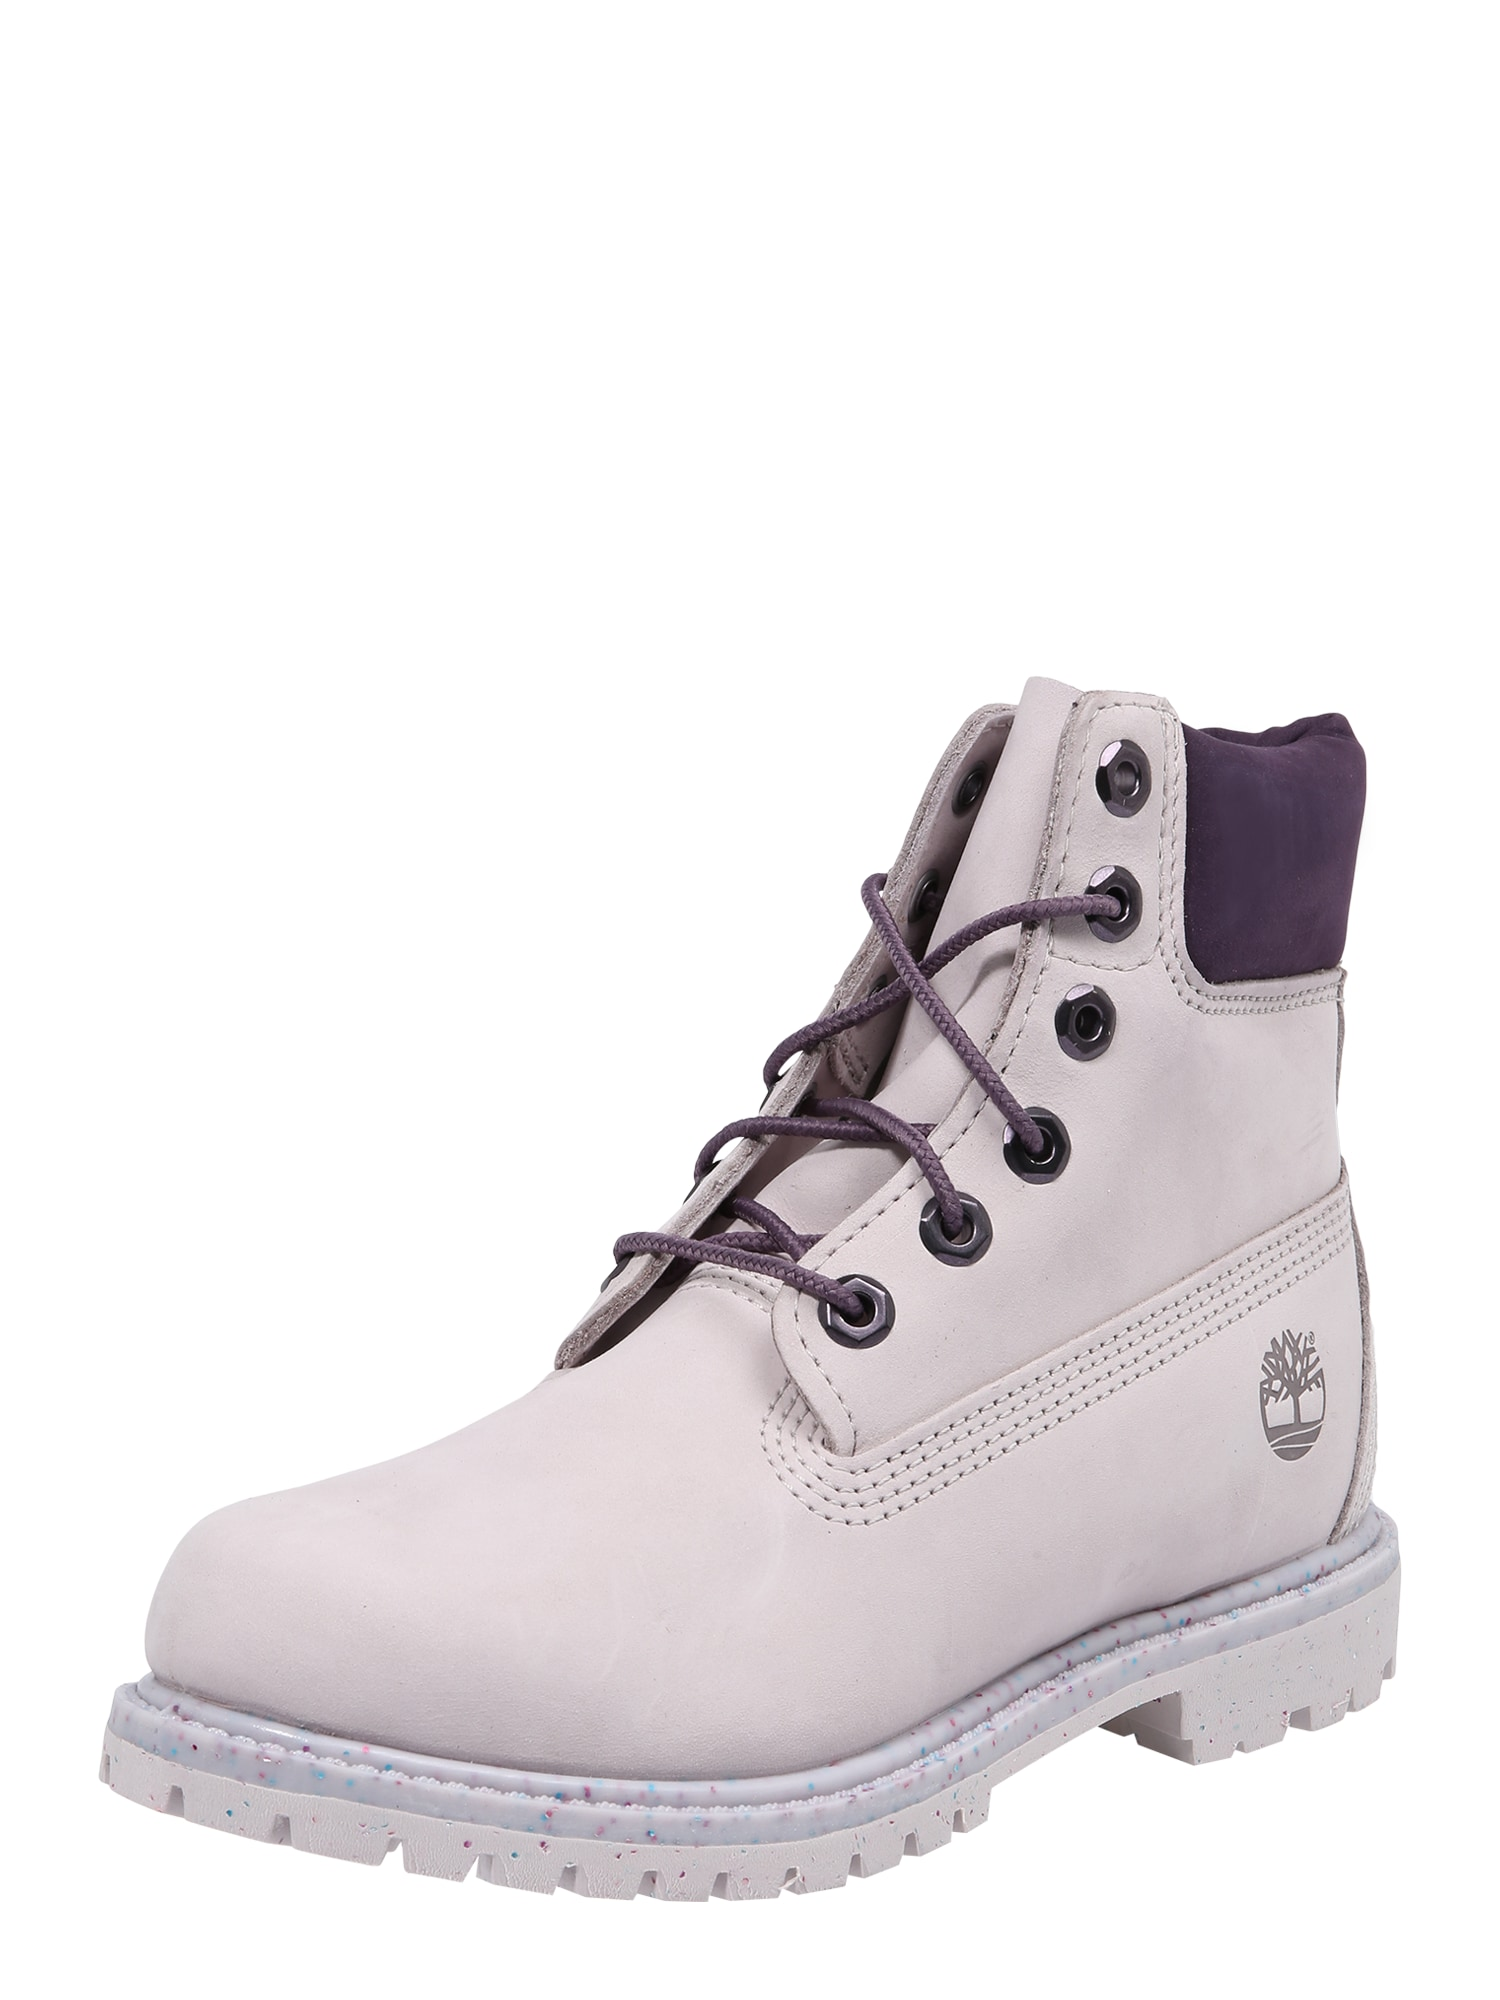 Šněrovací kozačky 6in Premium Boot šeříková TIMBERLAND